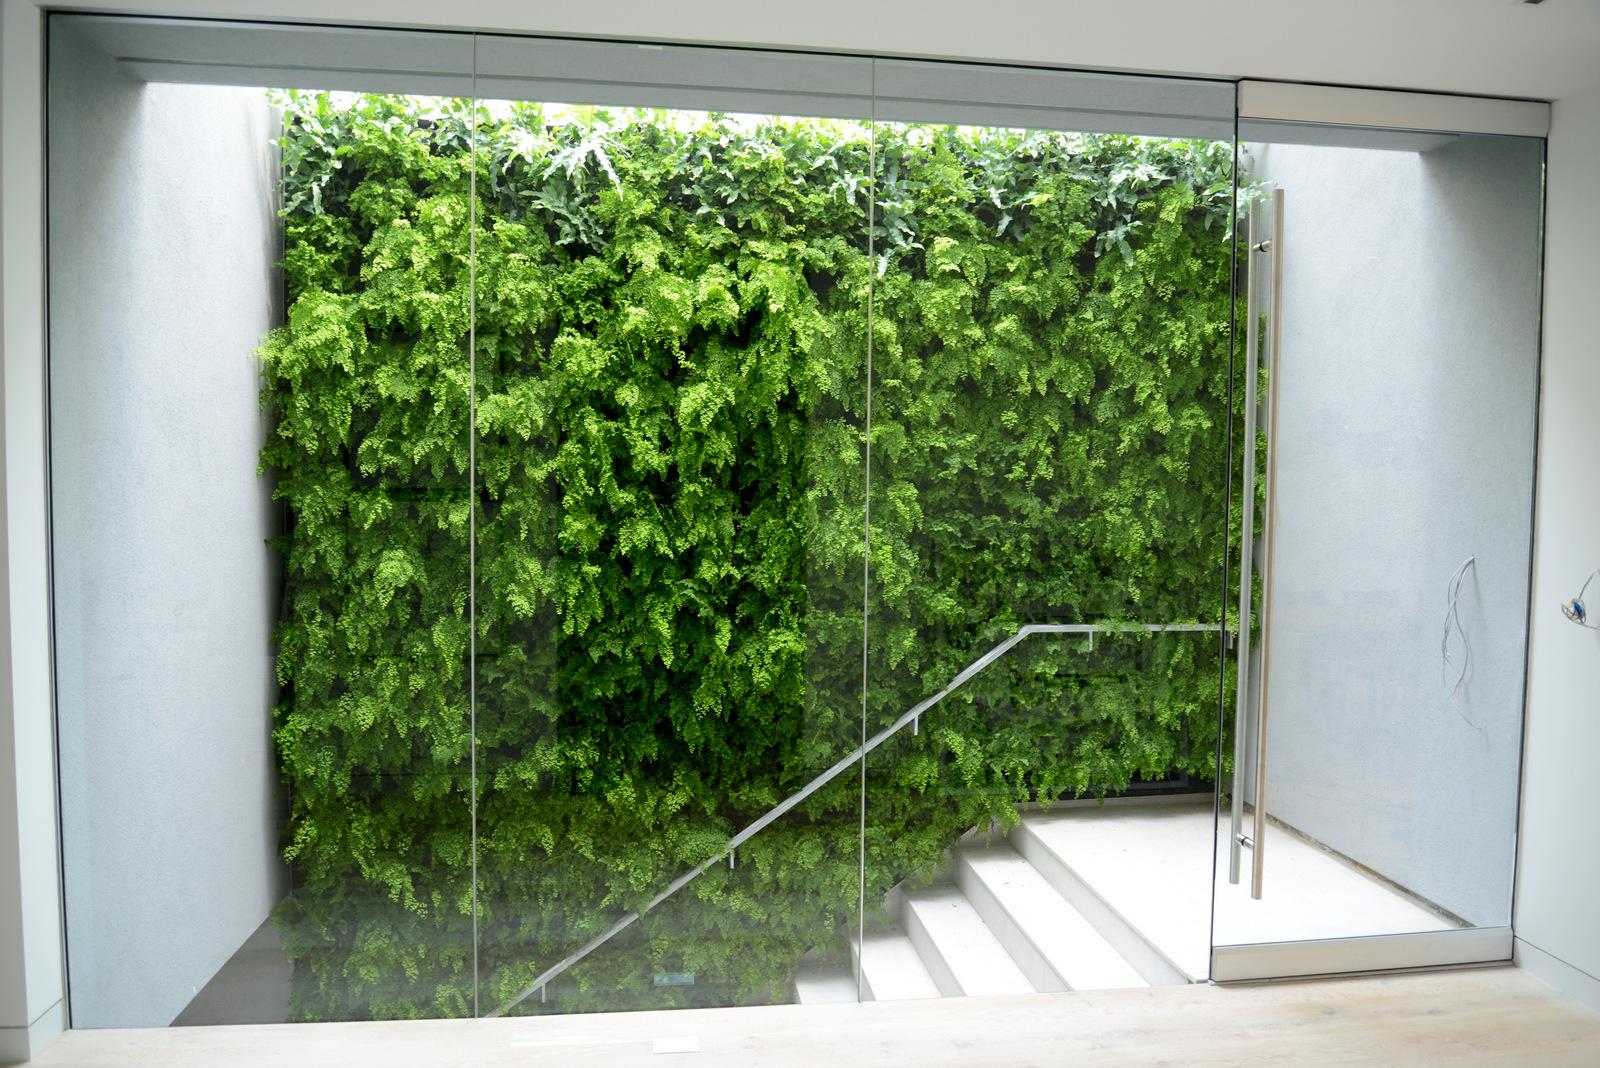 Chris Bribach, Plants On Walls, Artthaus, Florafelt System